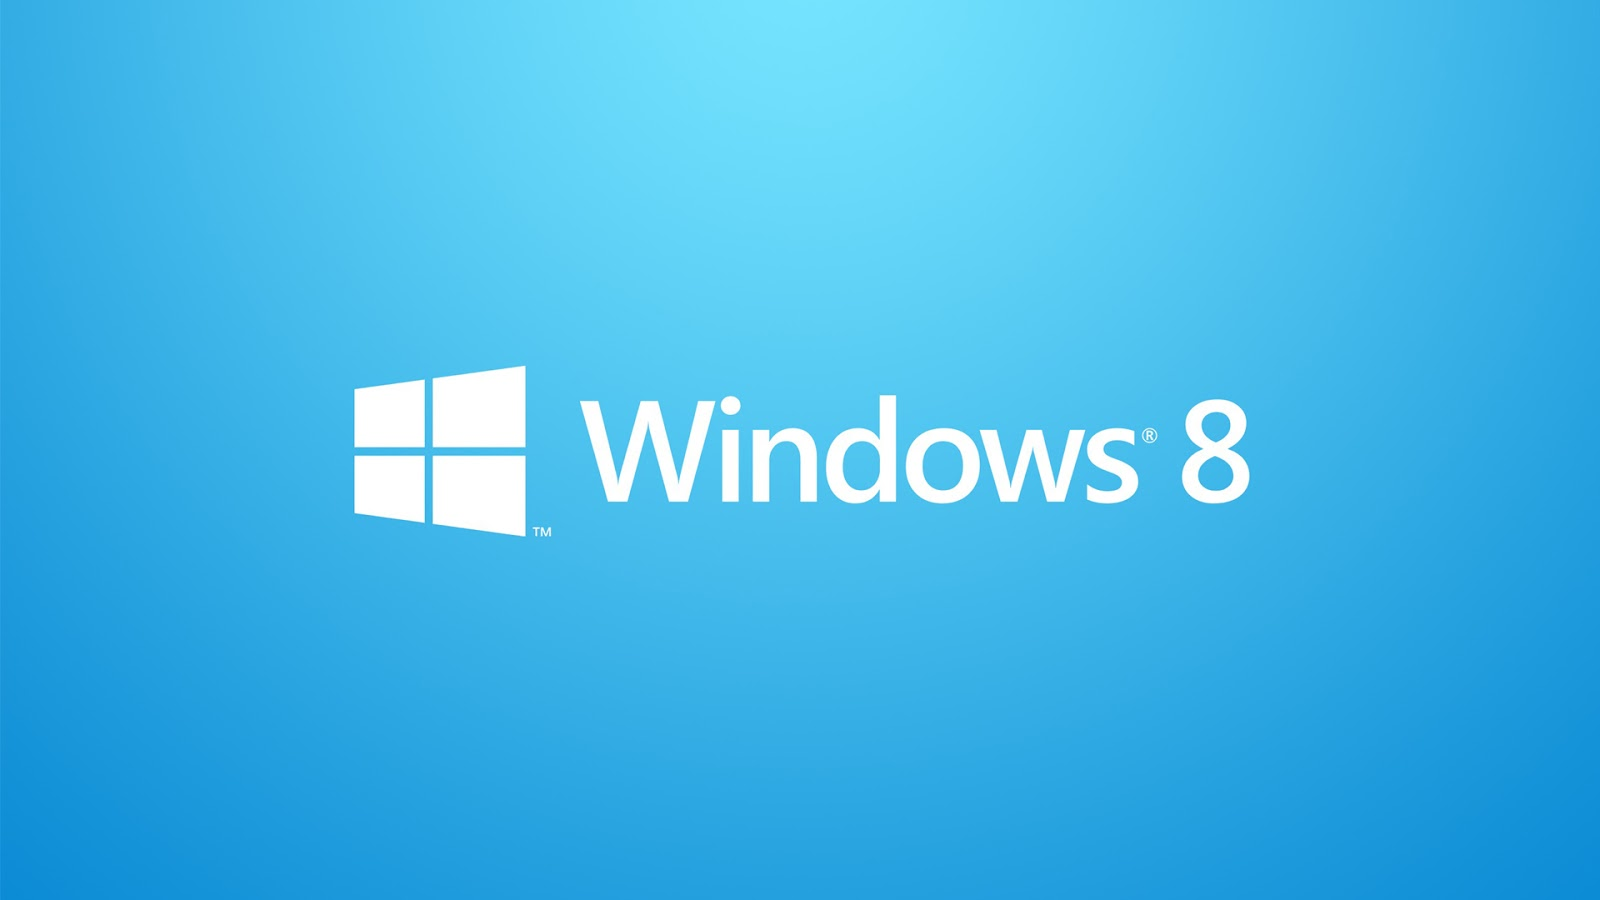 Windows 8 Images Hd - HD Wallpaper